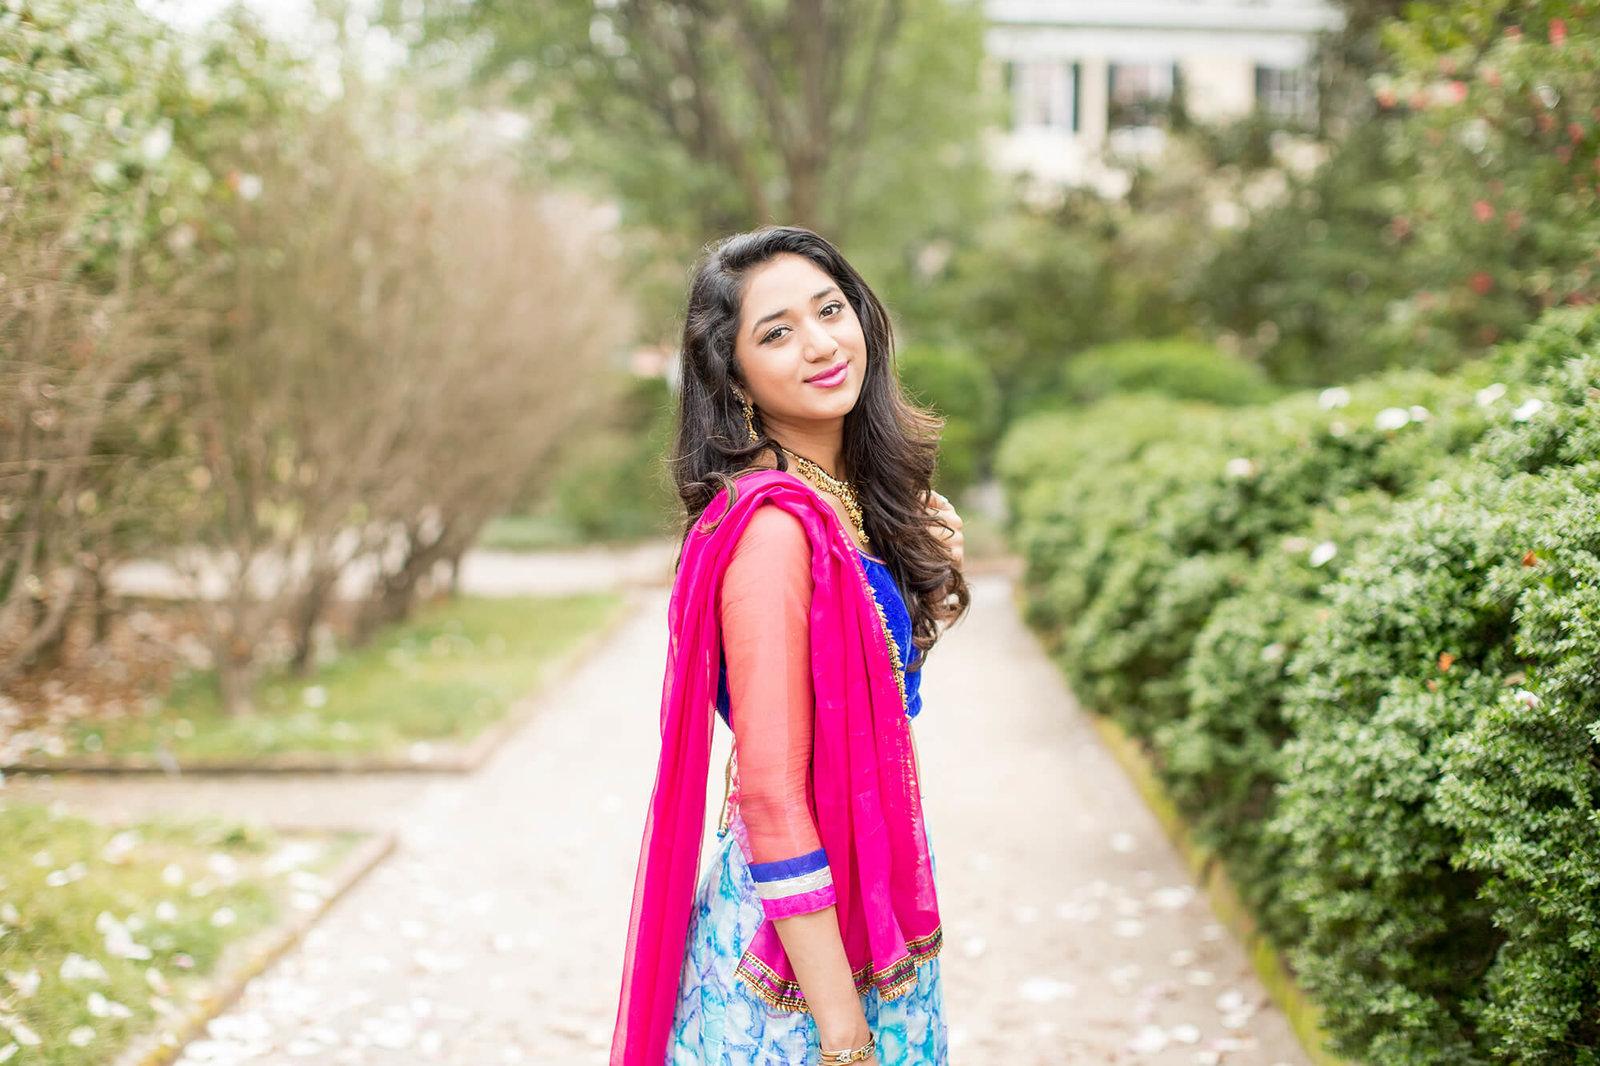 Hindu-Lace-House-Styled-Shoot_Columbia-Wedding-Photographer_Jessica-Hunt-Photography_2016-31